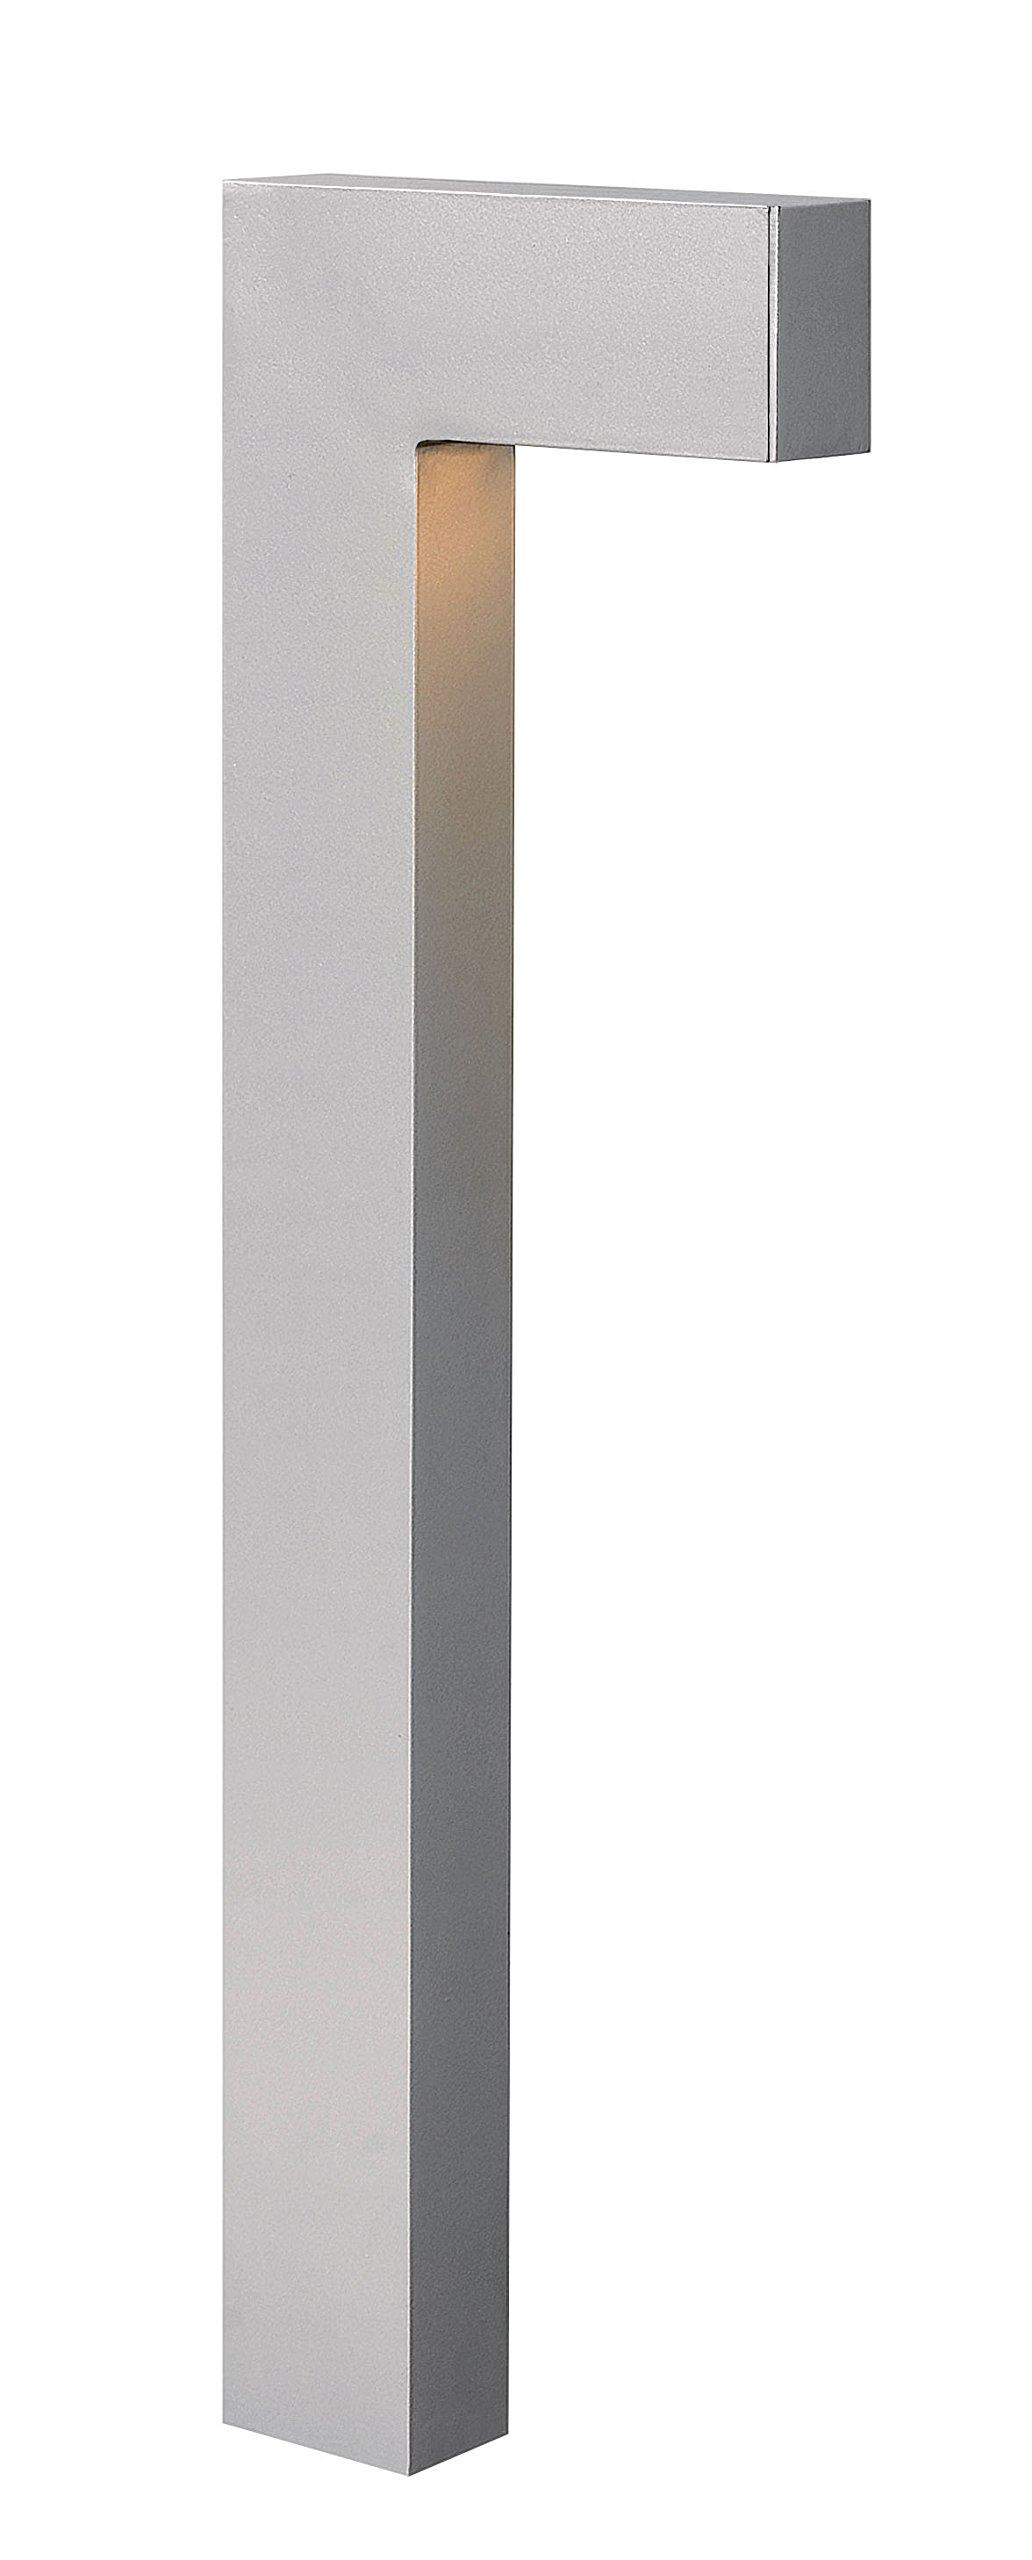 Hinkley Lighting 1518TT-LED Atlantis LED Path Light with 2.4-Watt 12-Volt LED Light Source, Titanium Powder Coat